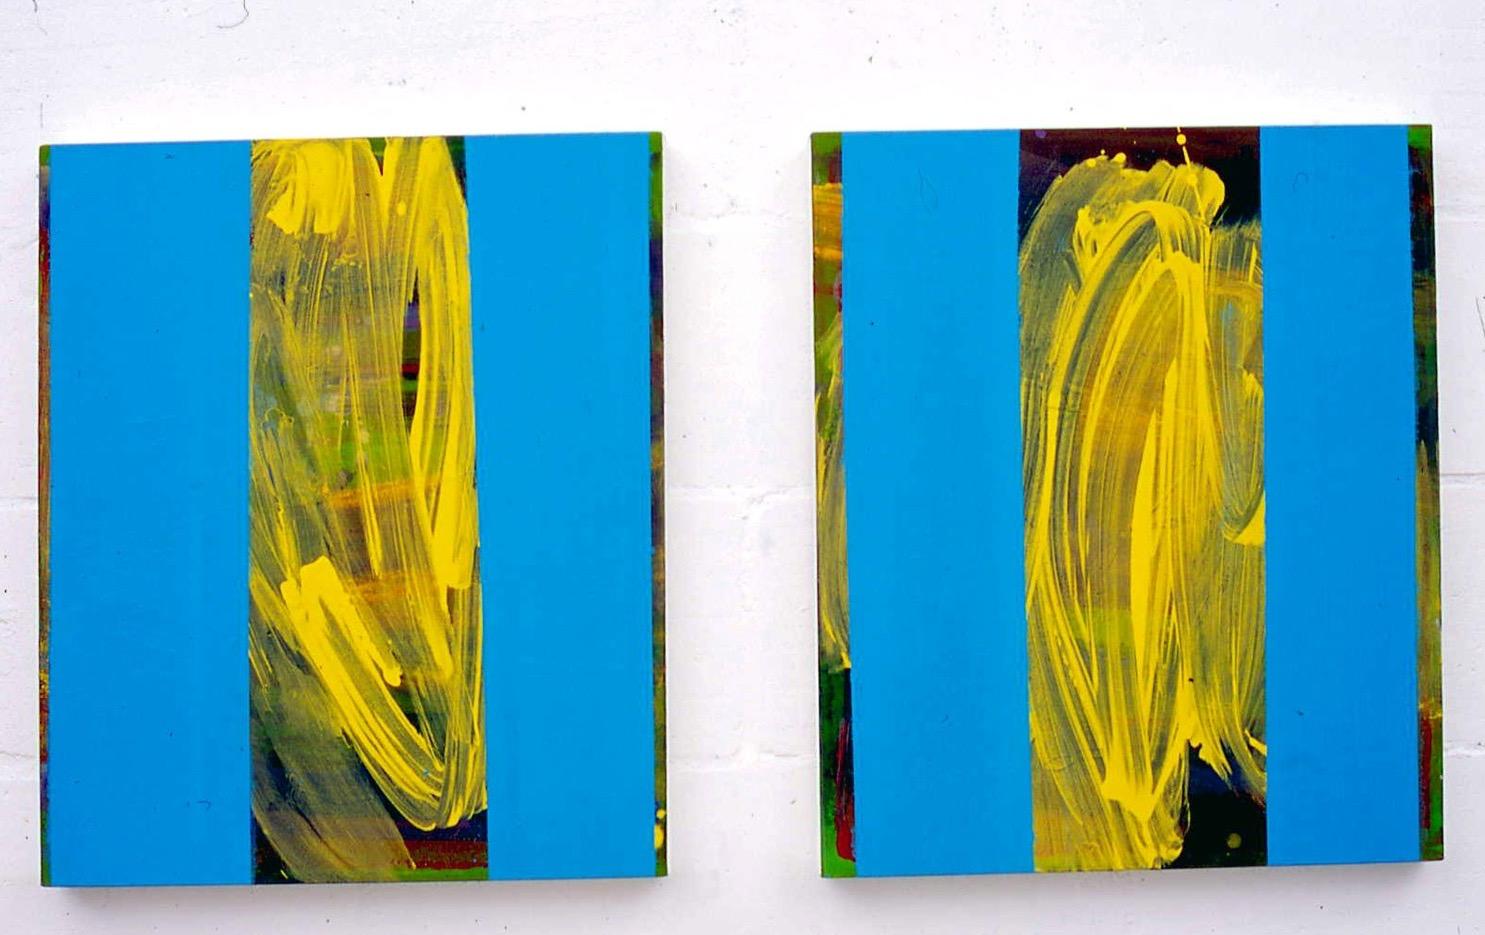 Full stop  acrylic on canvas 56cm x 51cm x 2  2002